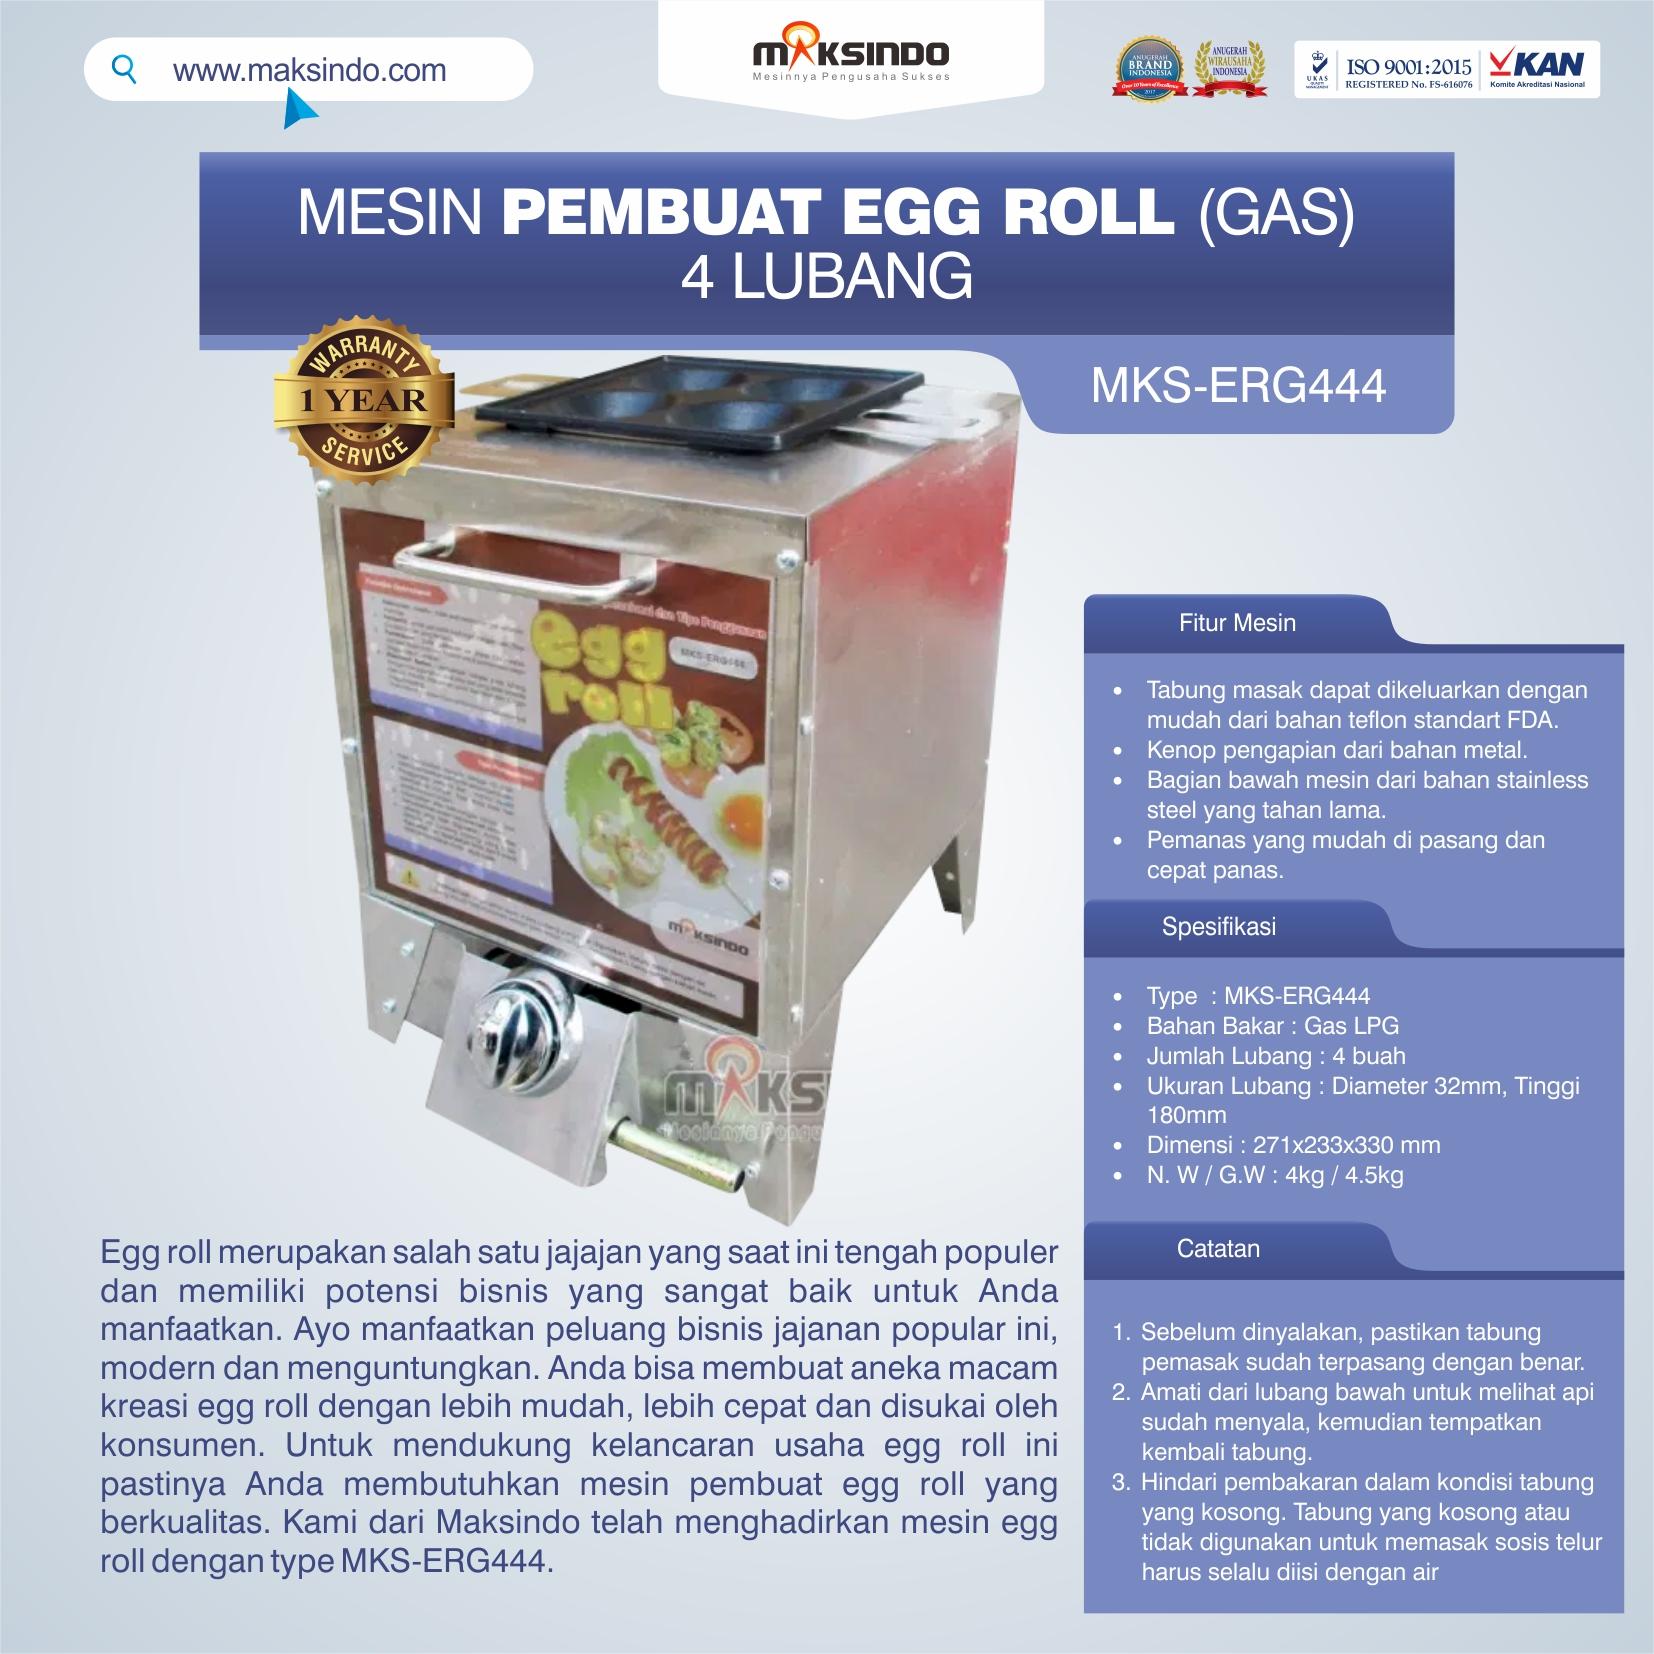 MKS-ERG444 Mesin Pembuat Egg Roll (Gas) 4 Lubang